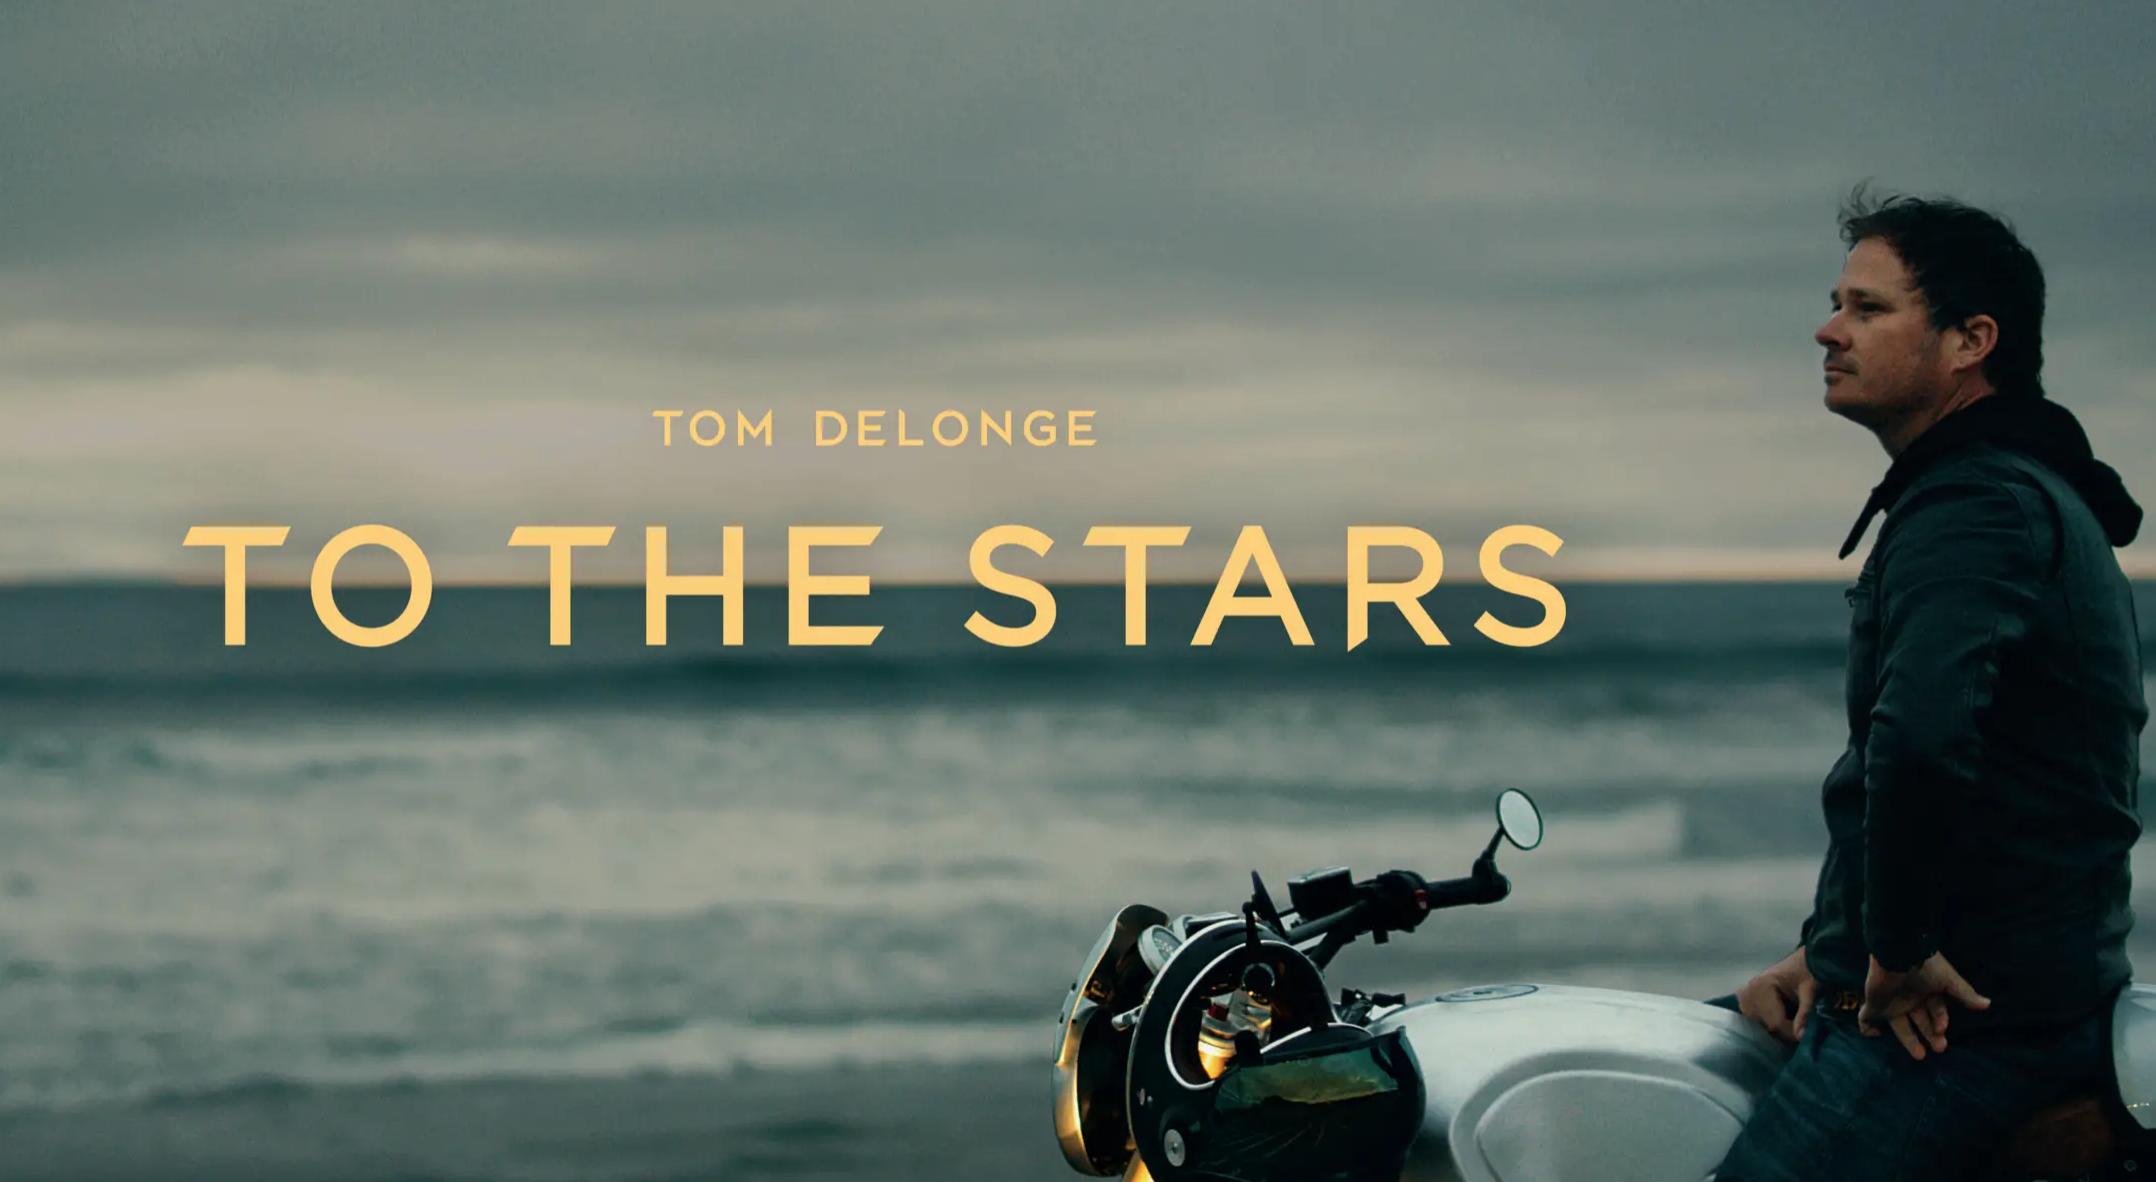 Meta: Tom Delonge - To The Stars